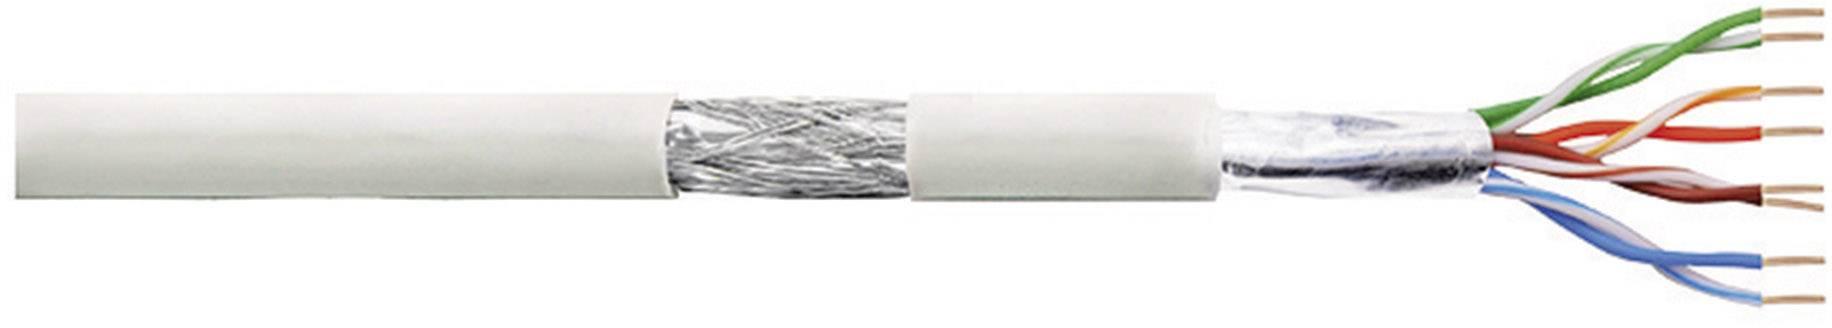 Patch kabel LogiLink CAT5E SF/UTP, šedá, 100 m